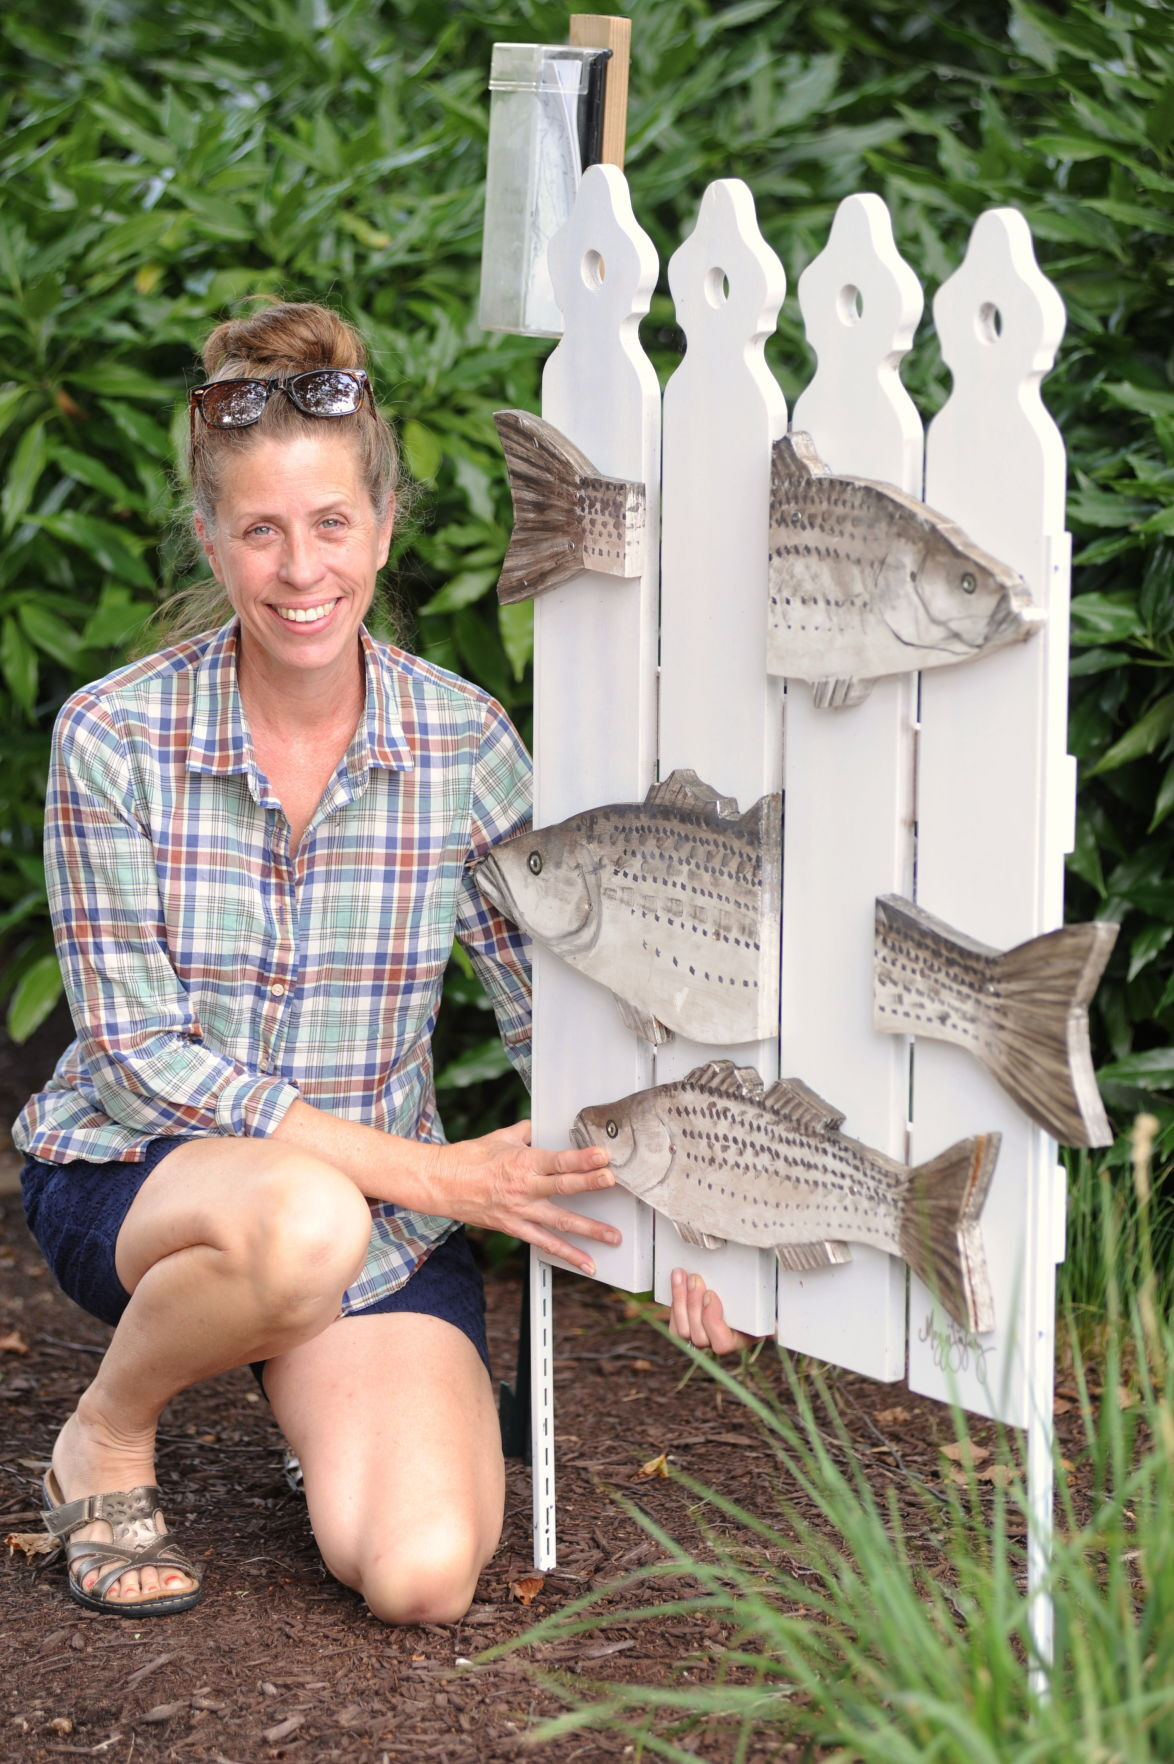 Oxford Picket fences raise money